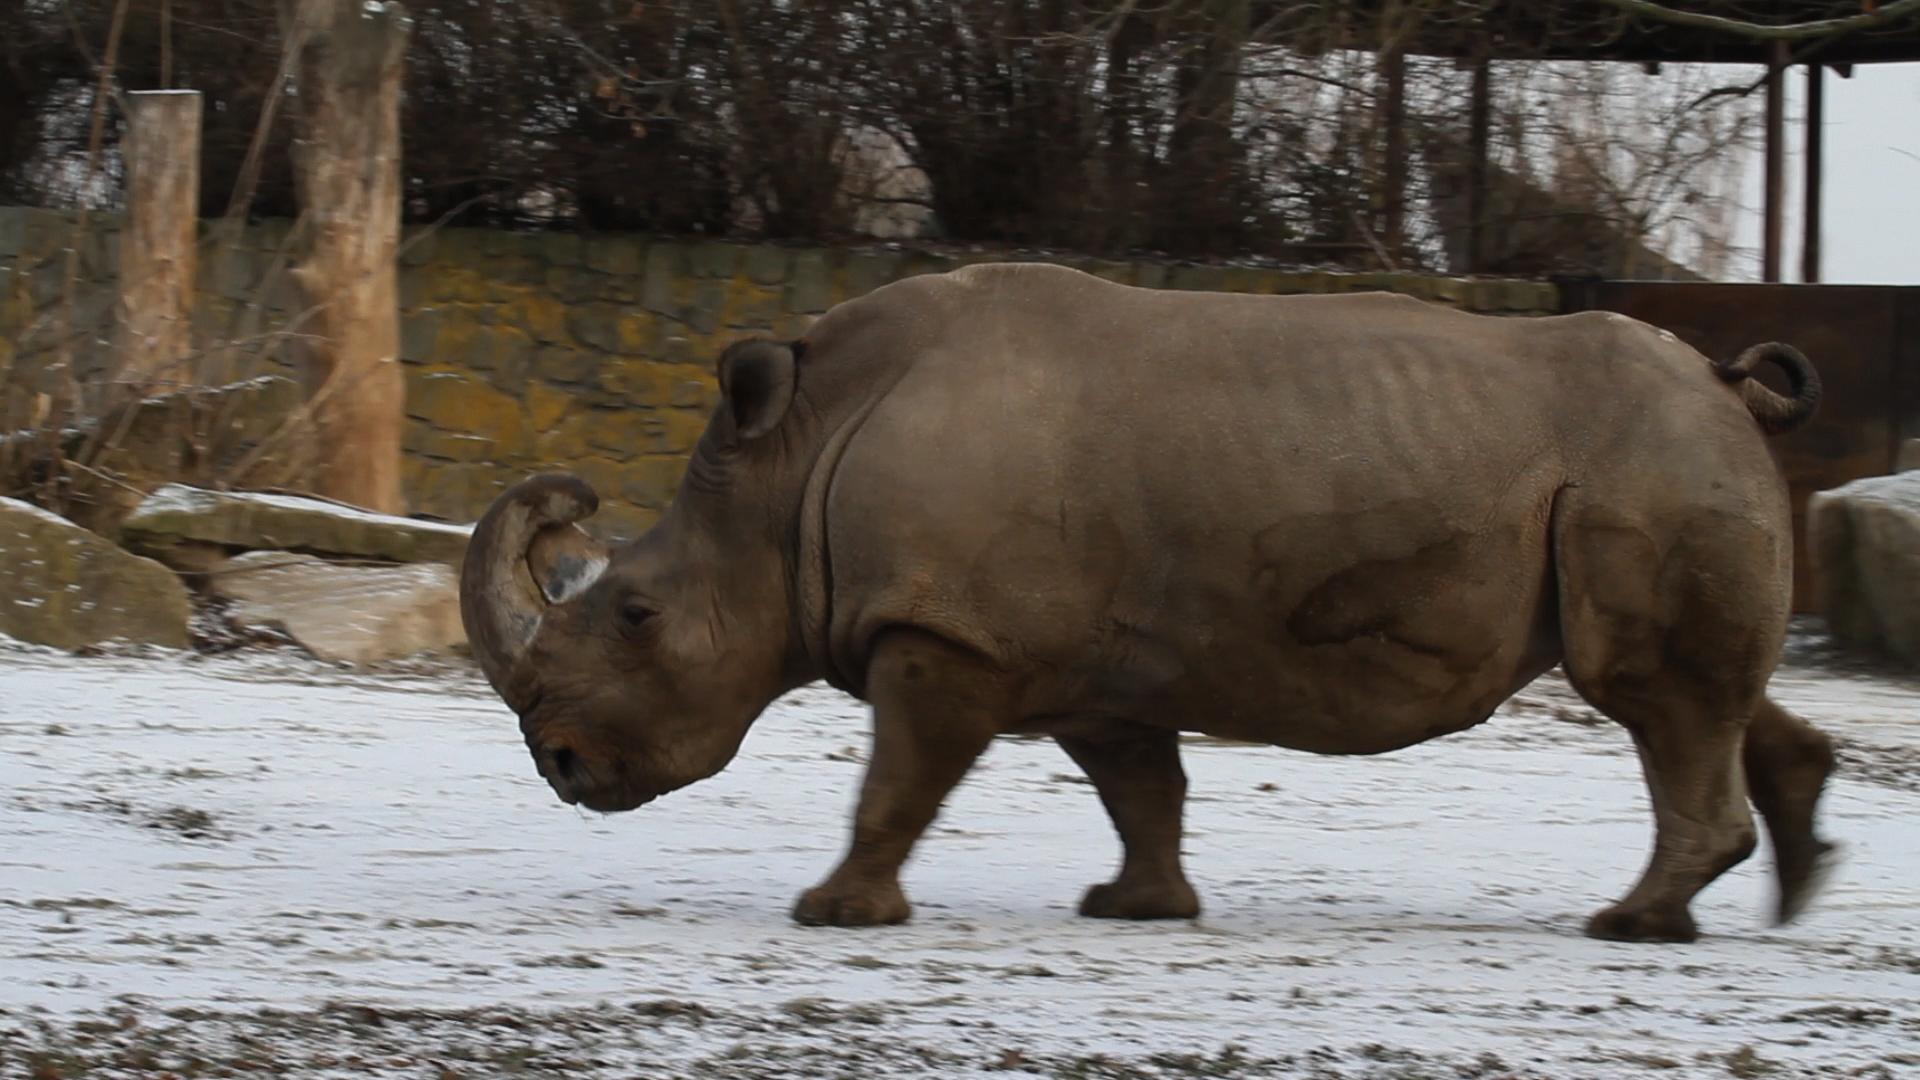 Rhino datation